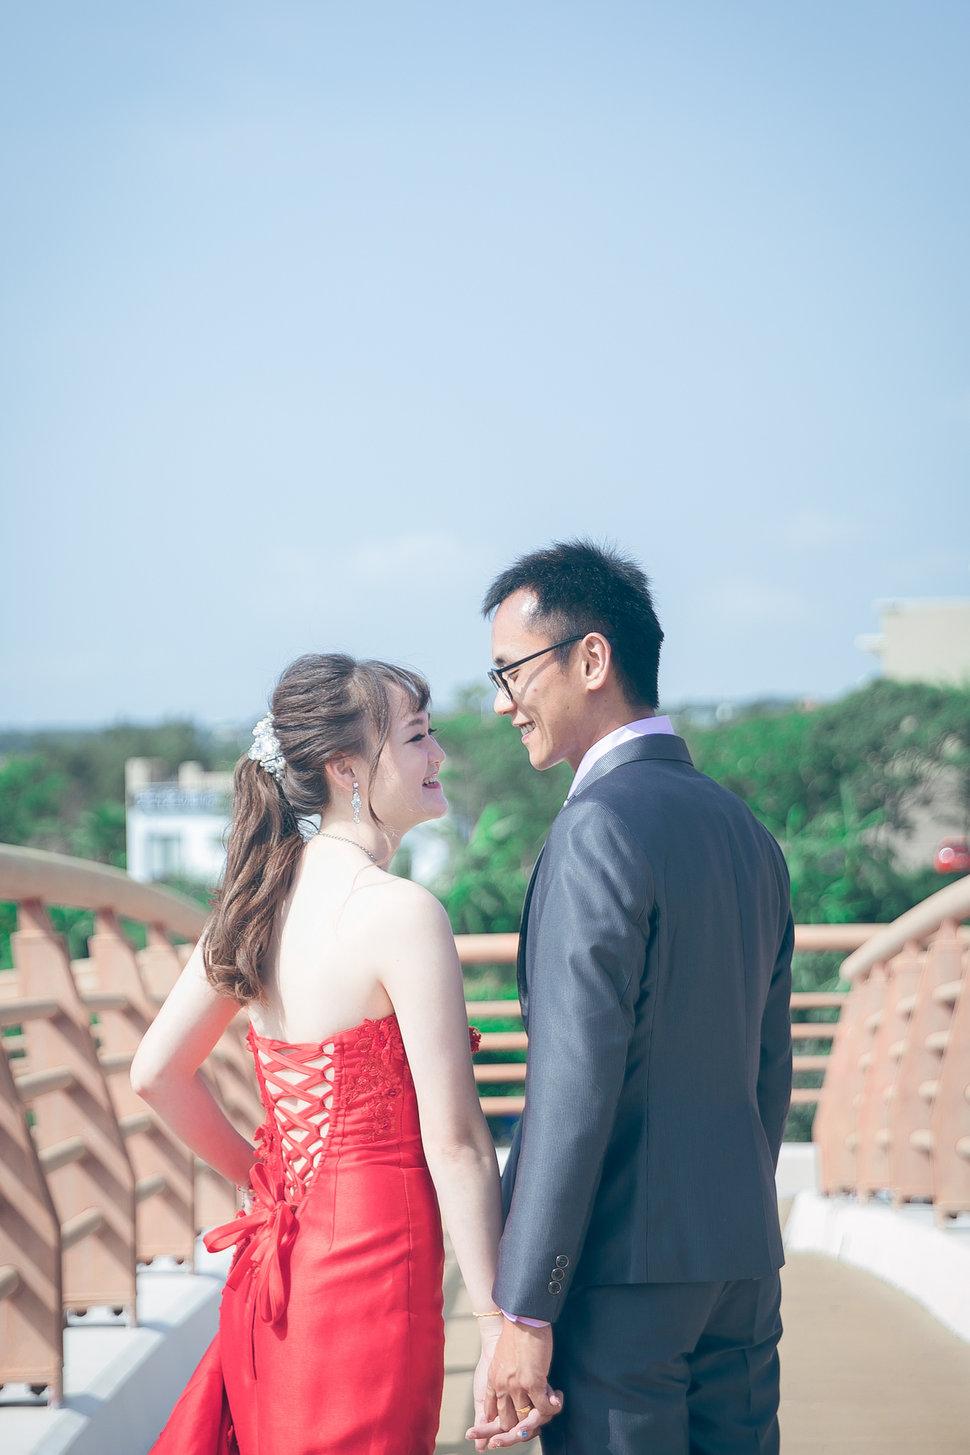 42657907662_f0a332a030_k - J Photographer《結婚吧》